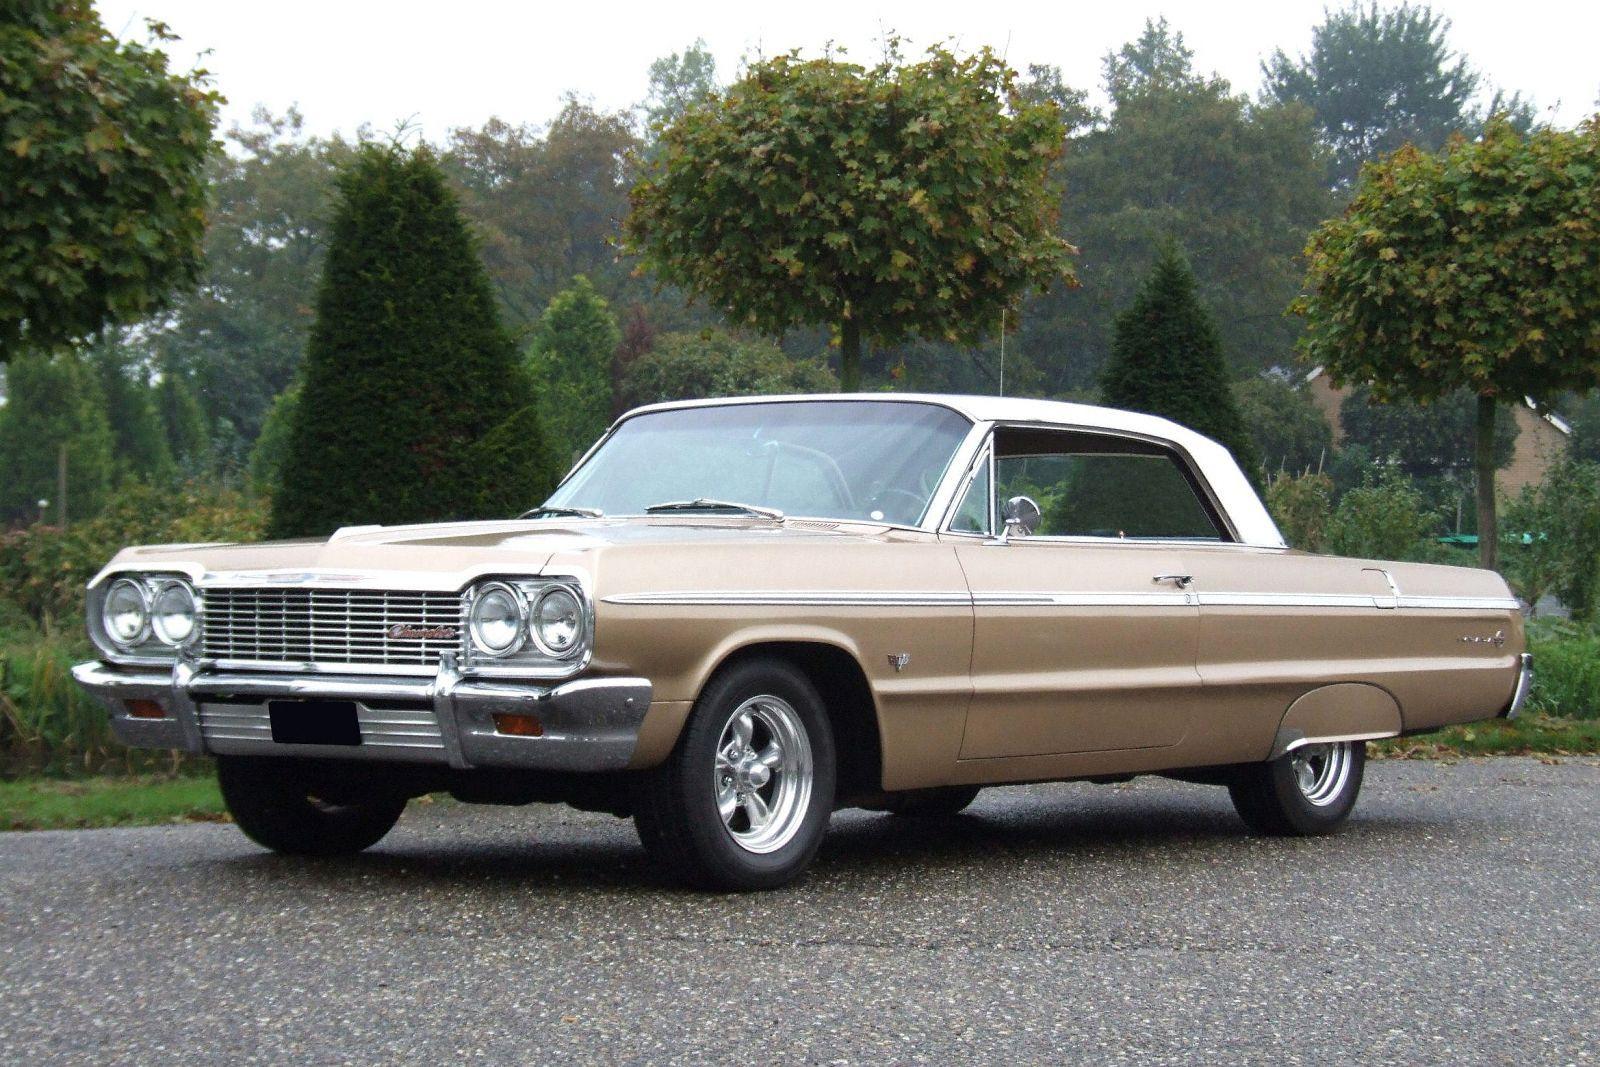 chevrolet impala ss hardtop coupe 1964 details. Black Bedroom Furniture Sets. Home Design Ideas